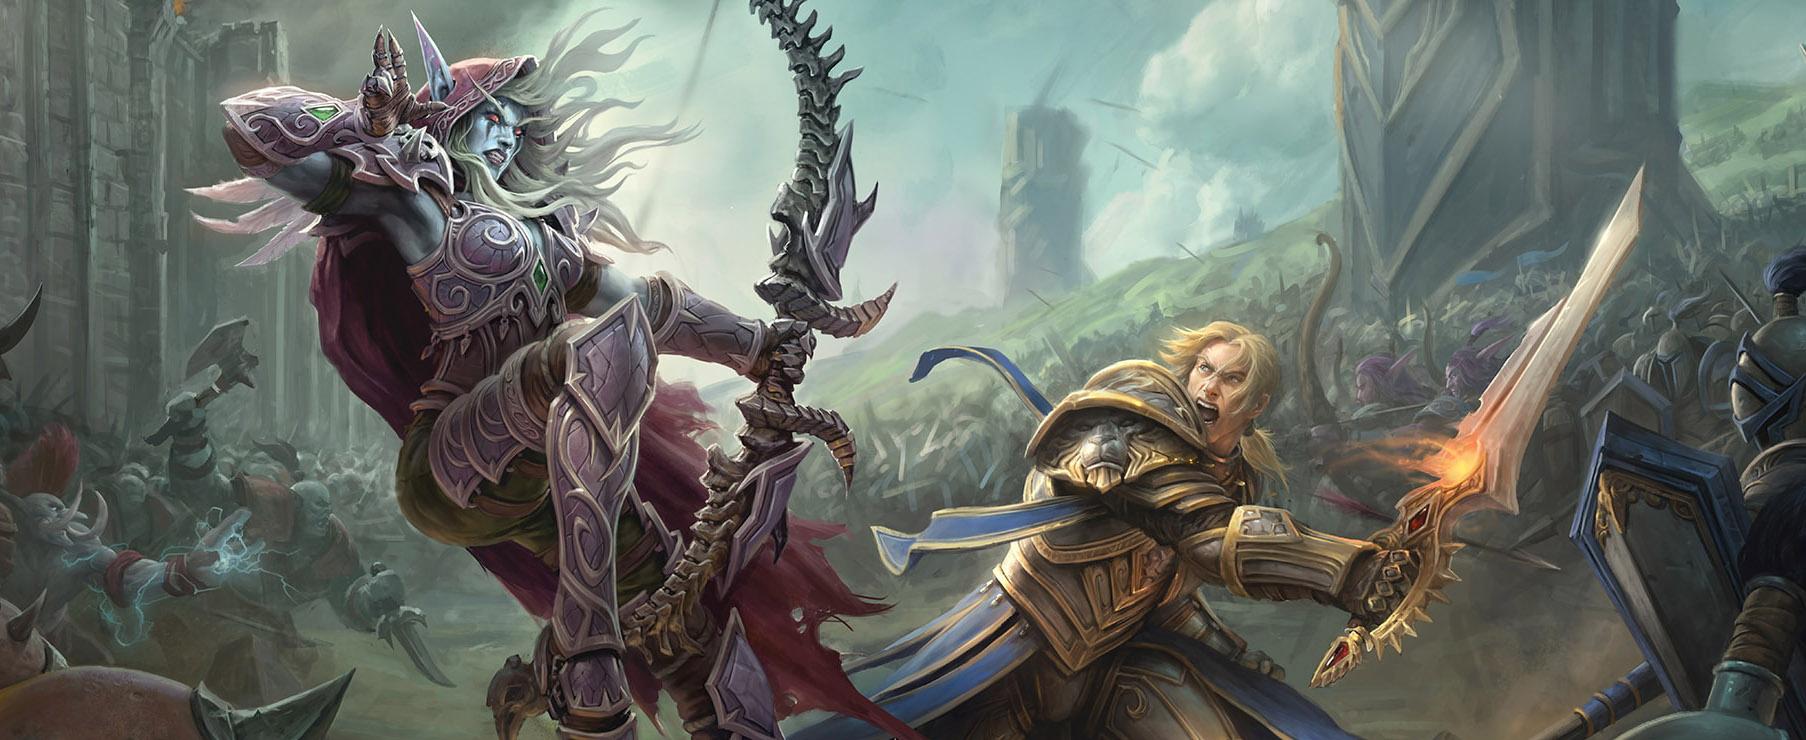 BlizzCon 2017: World of Warcraft's Next Expansion Revealed